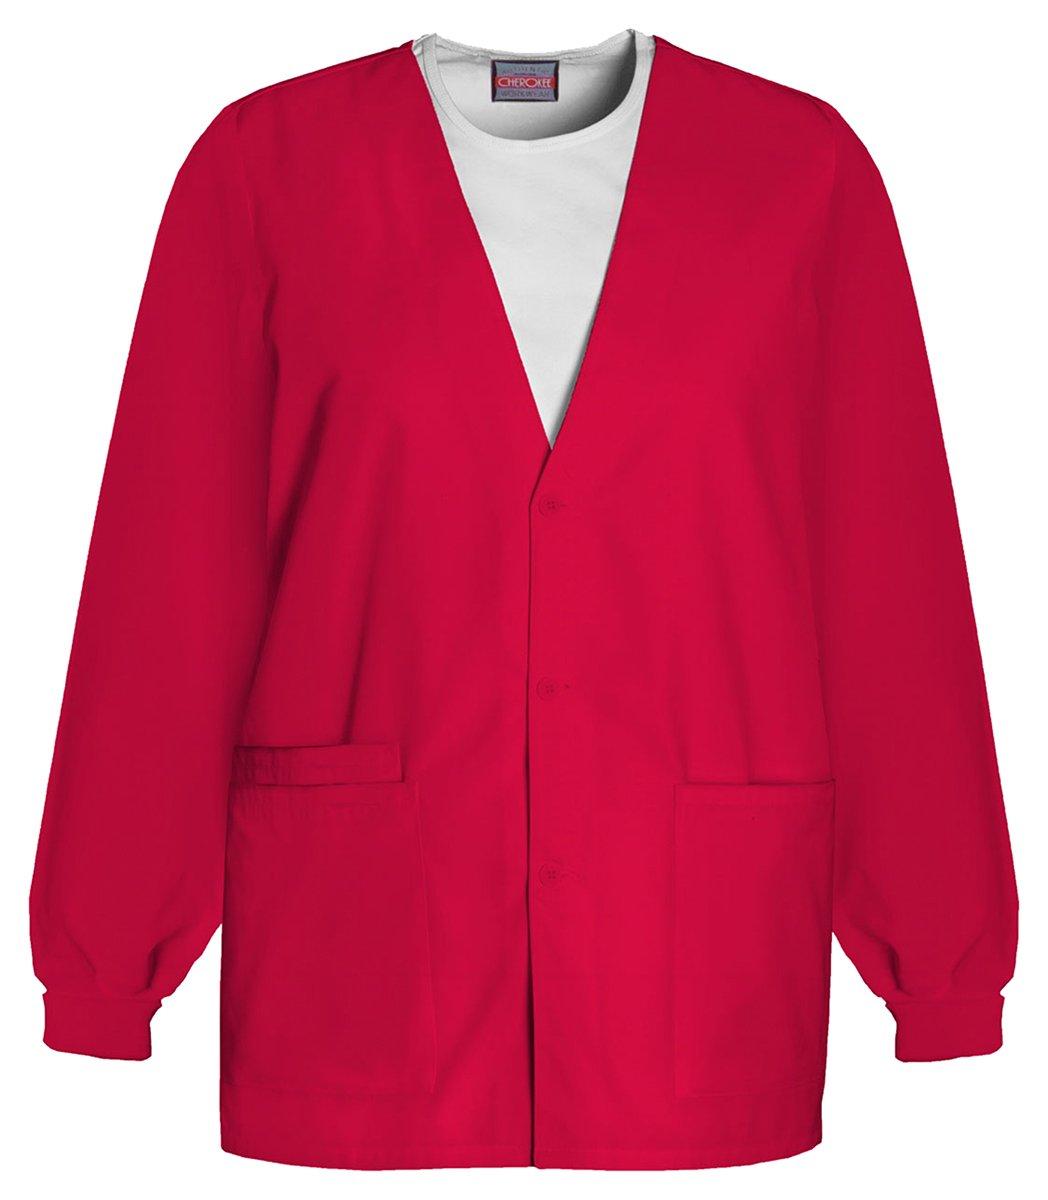 Cherokee Workwear Women's Cardigan Warm-up Jacket_Red_Large,4301